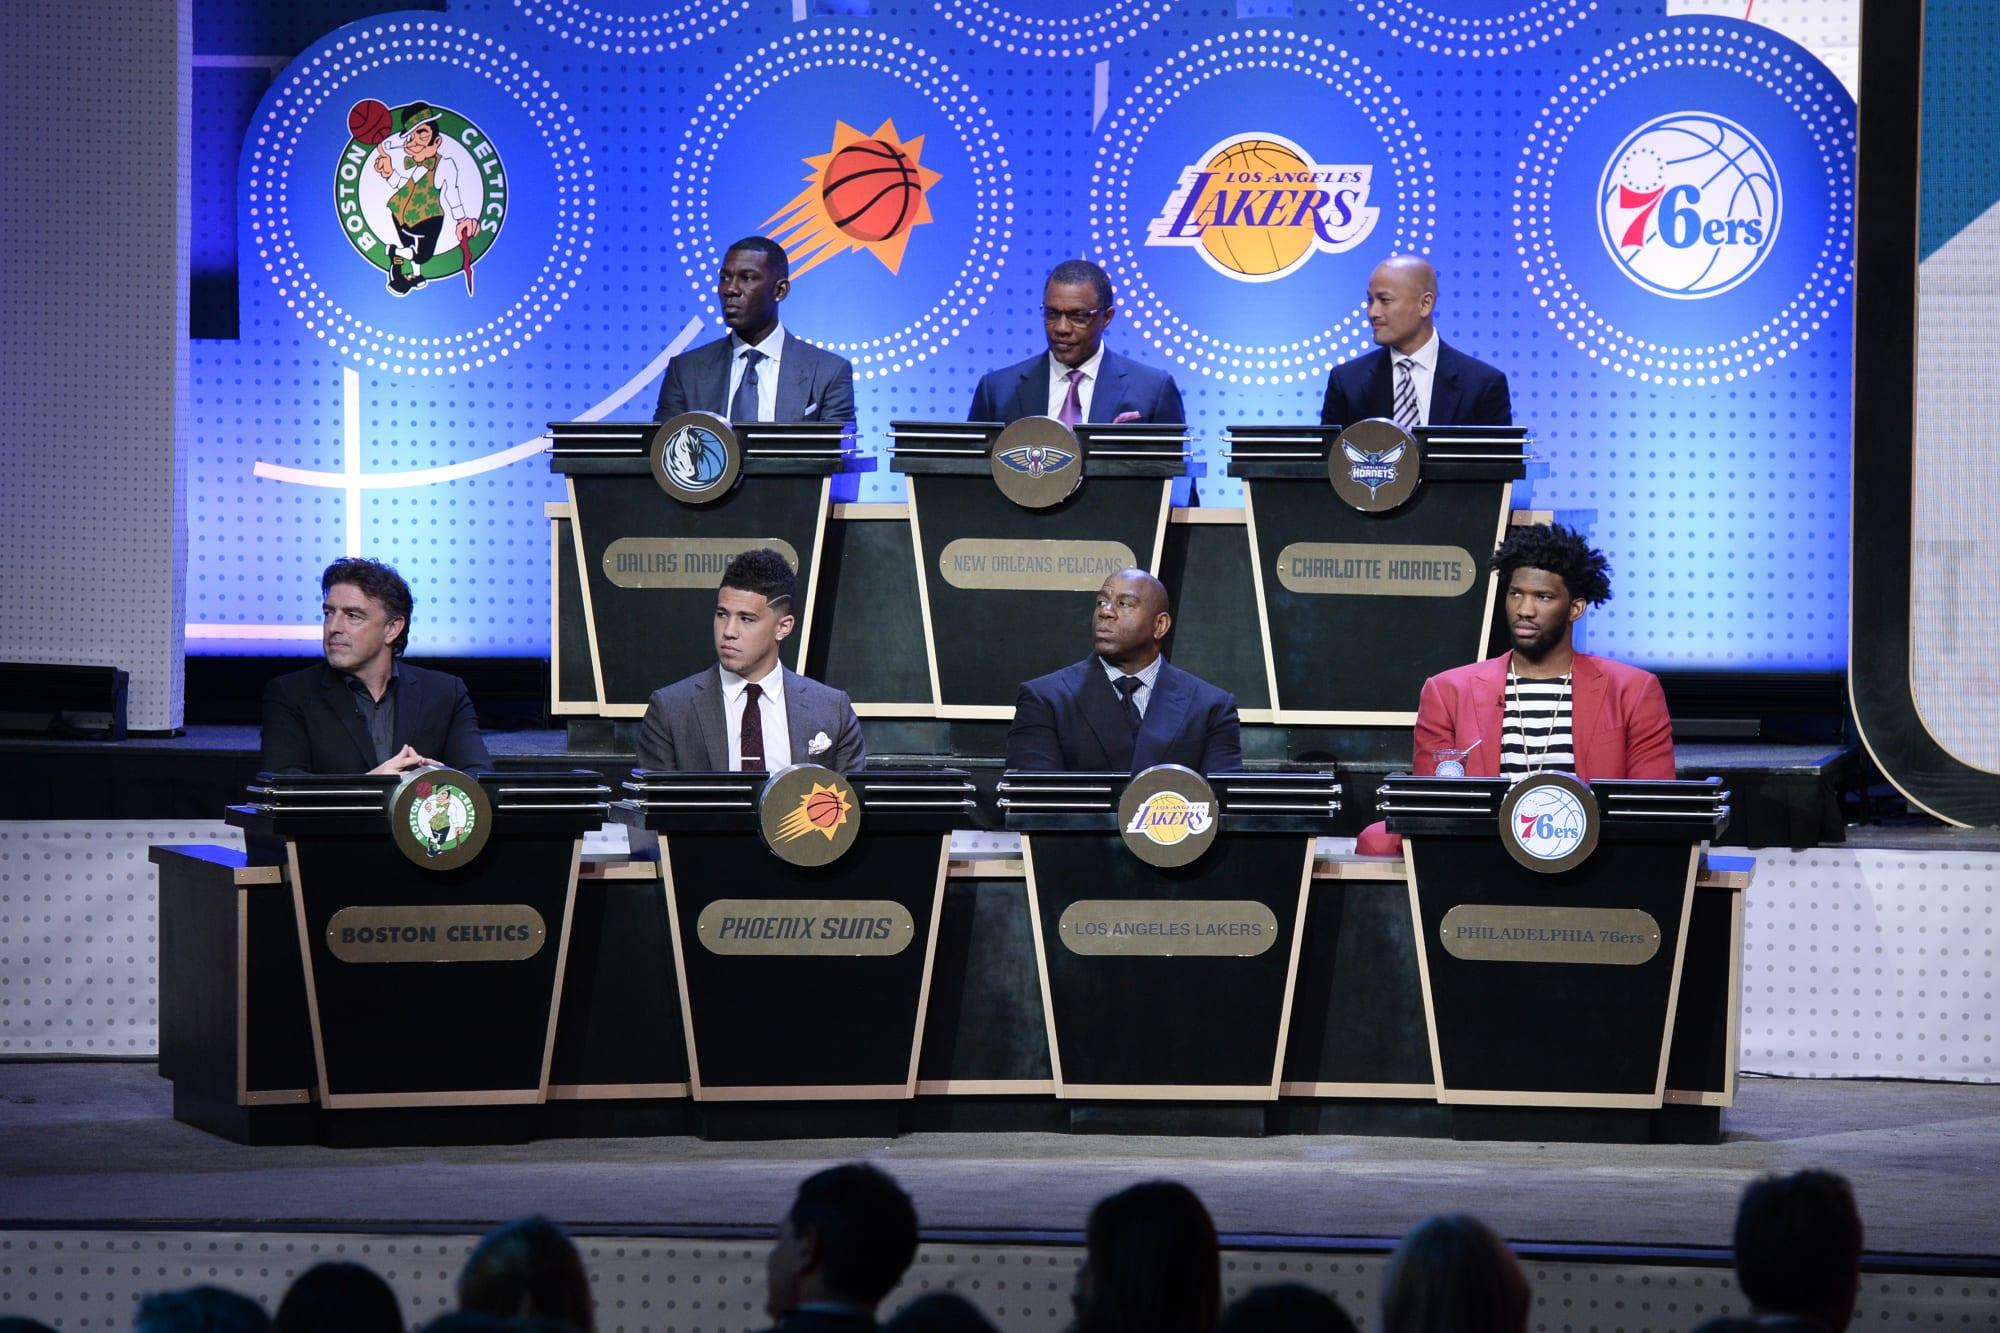 suns nba draft lottery reform has tanking been